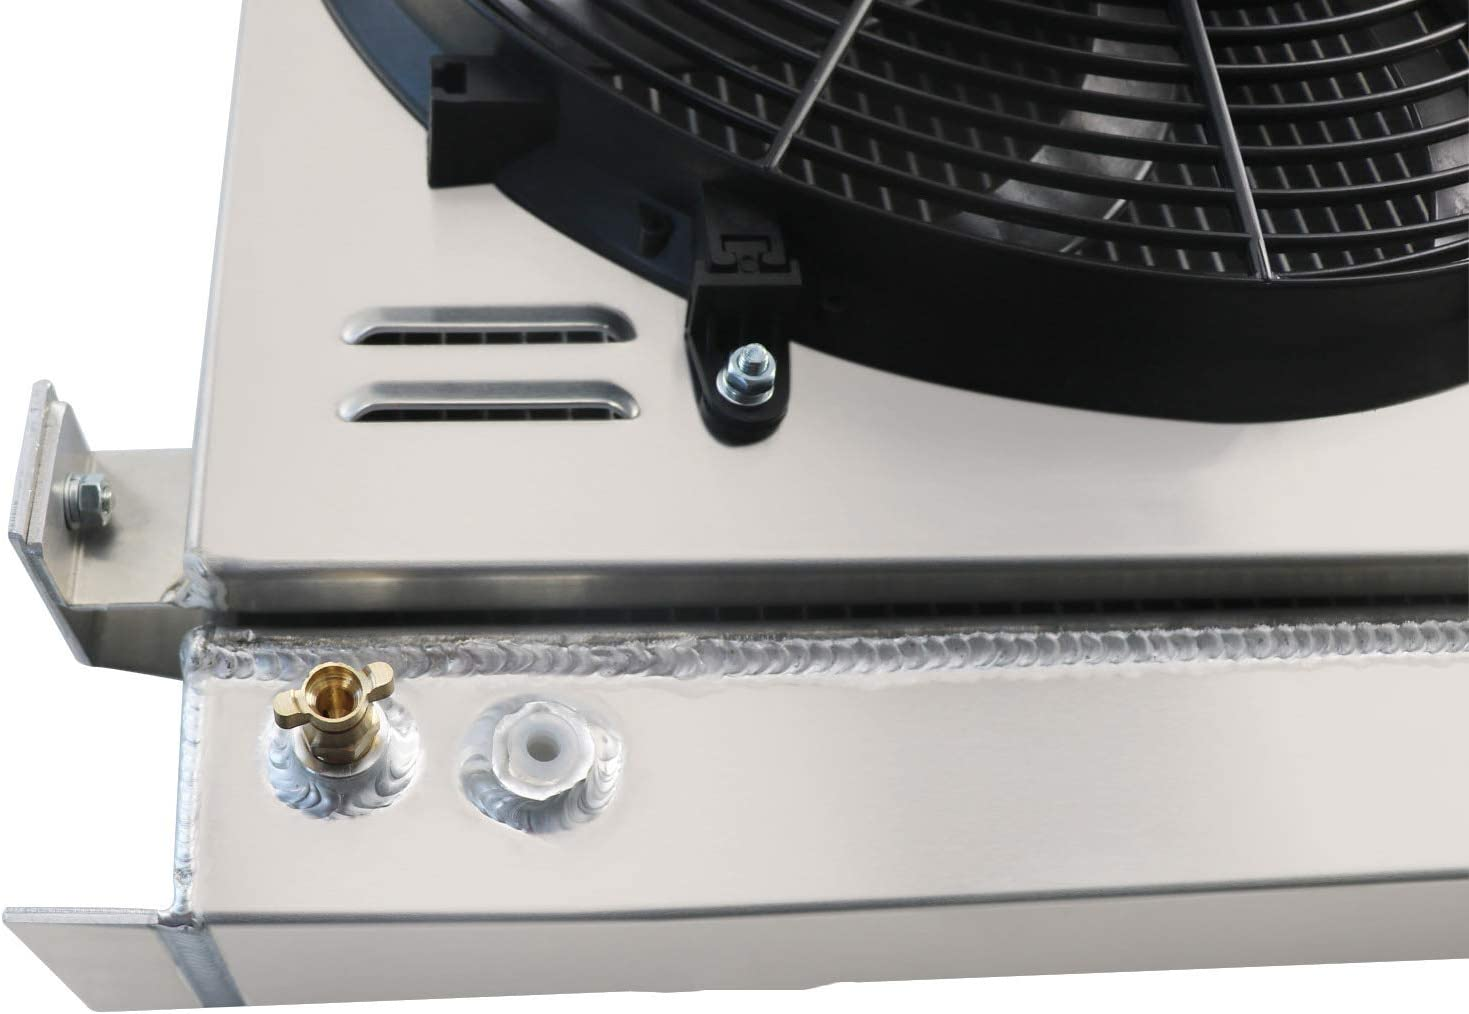 ALLOYWORKS 4 Row Full Aluminum Radiator Shroud Fan For 1930-1938 Ford Model A//B Grill Shells Chevy V8 Engine